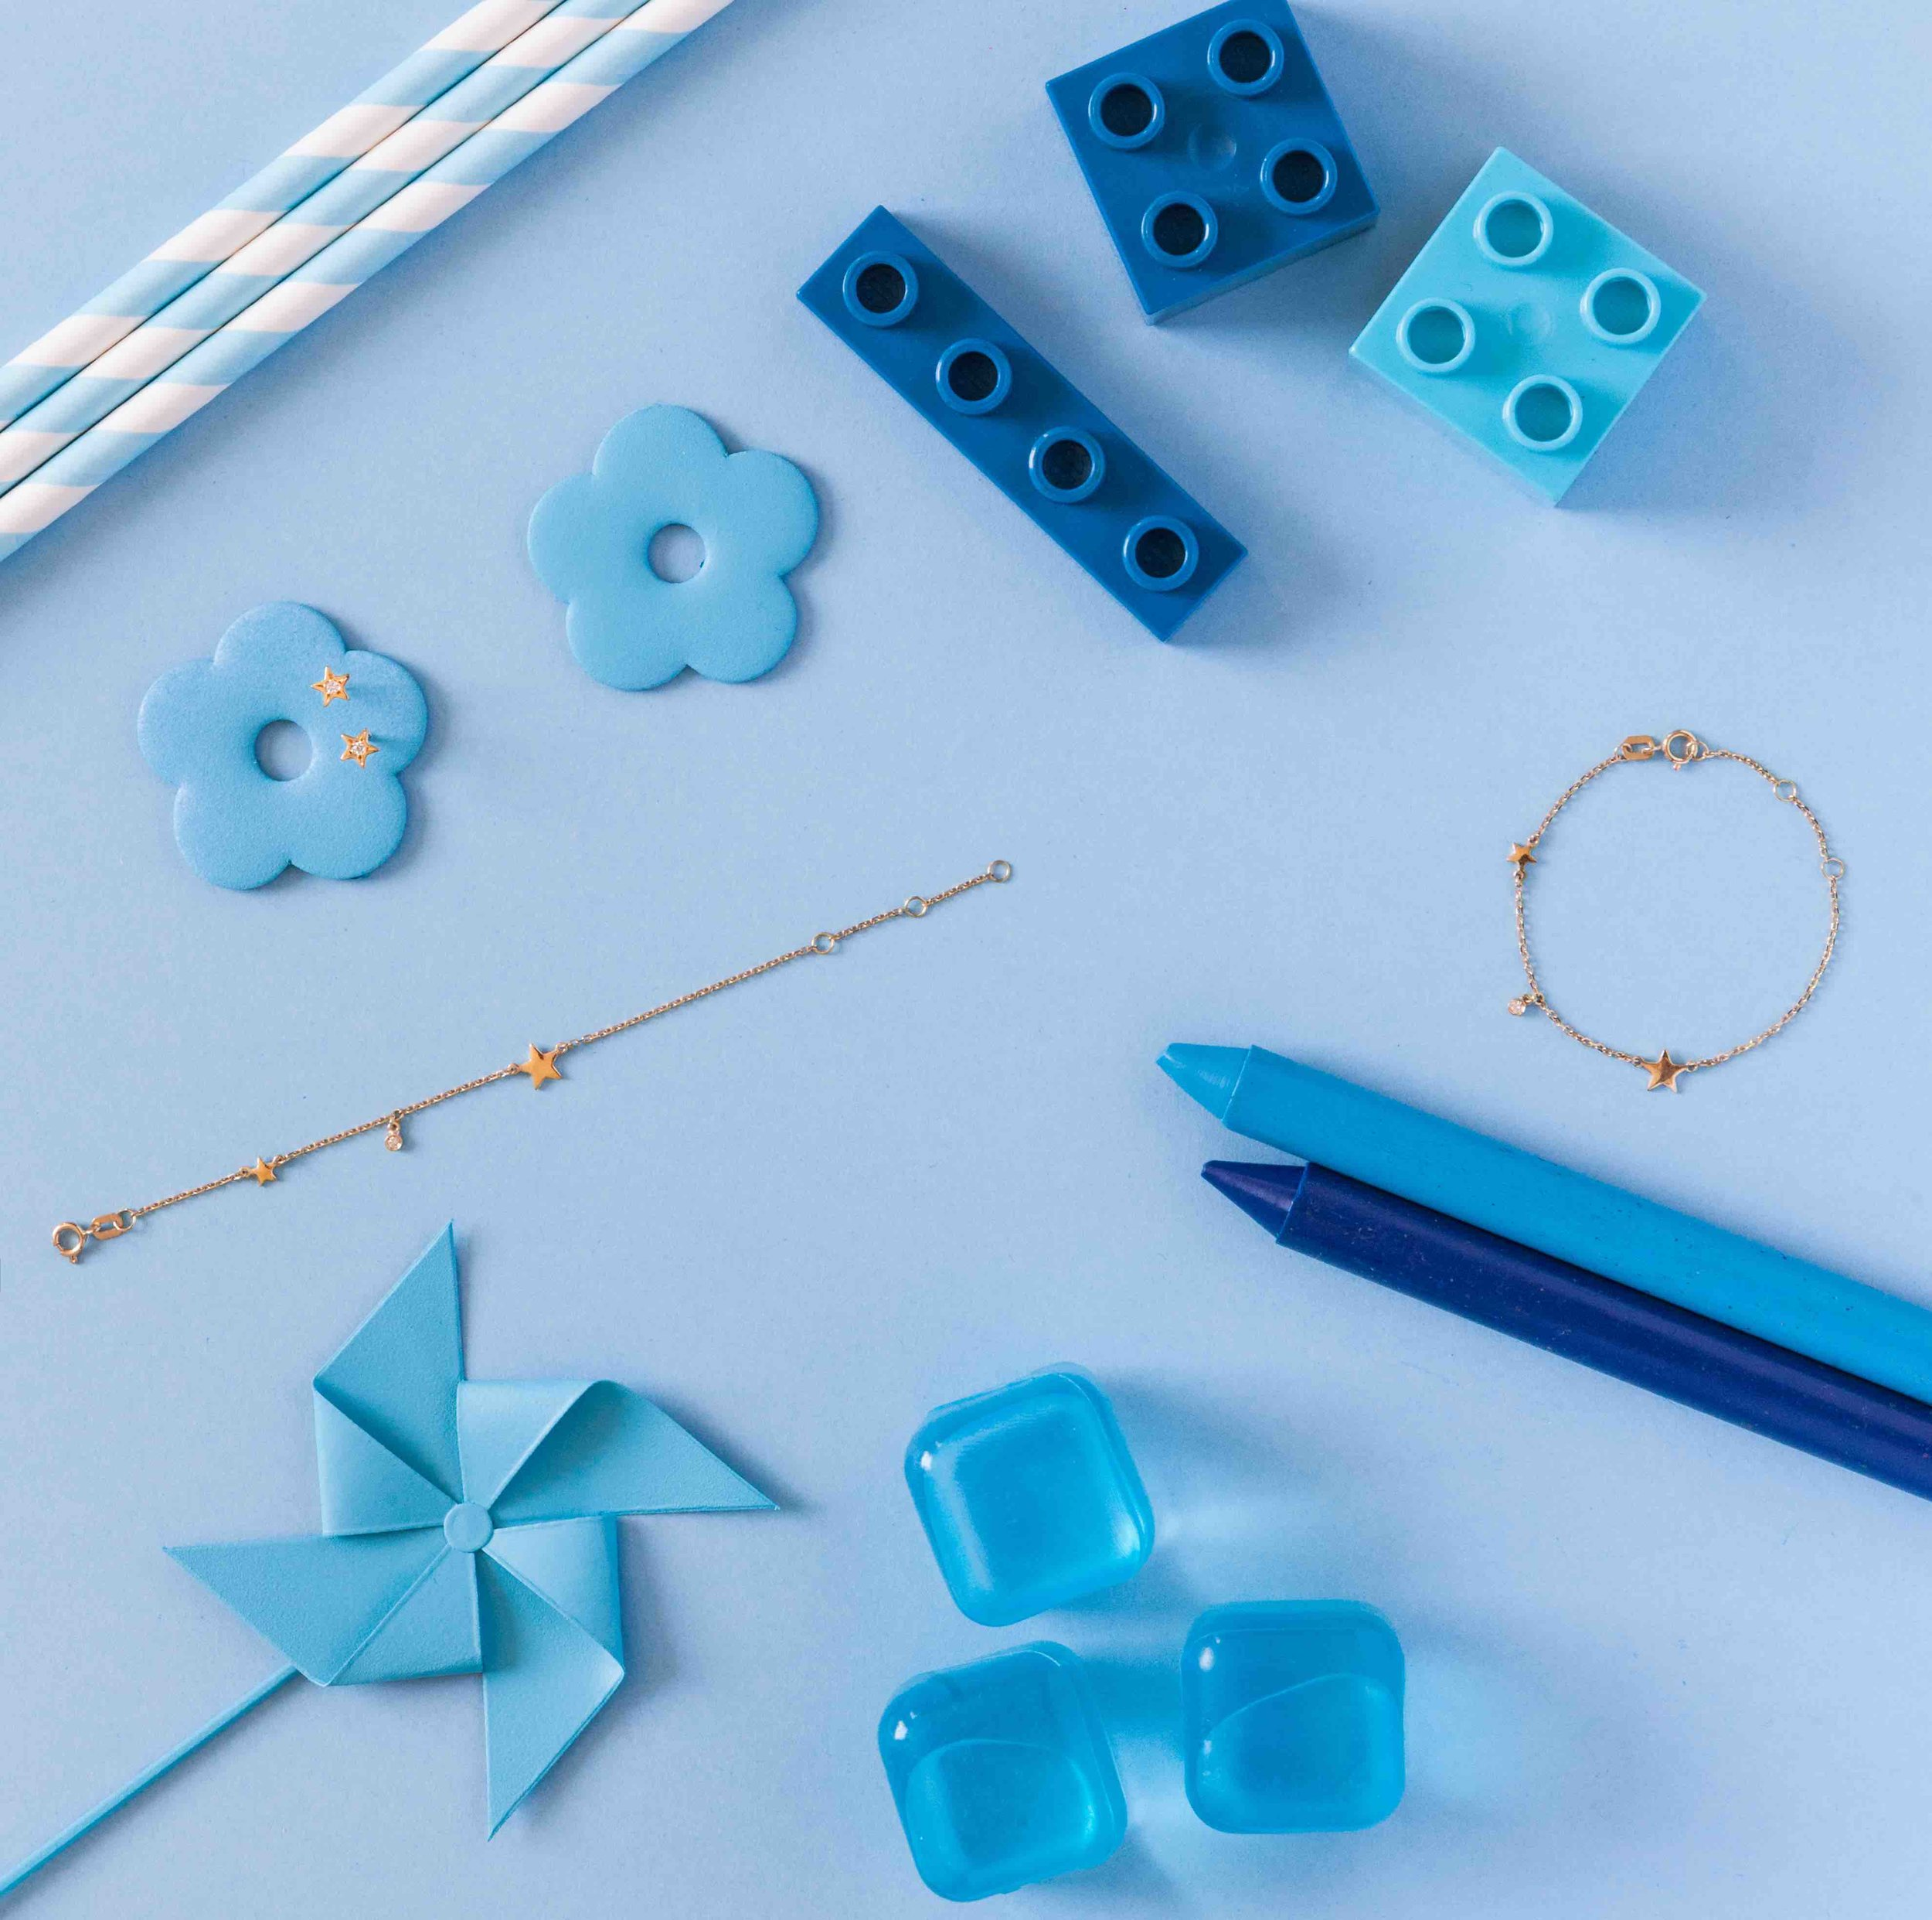 nova+cole%C3%A7%C3%A3o+joias+infantis+JULIA+BLINI. - Julia Blini, Designer de Jóias